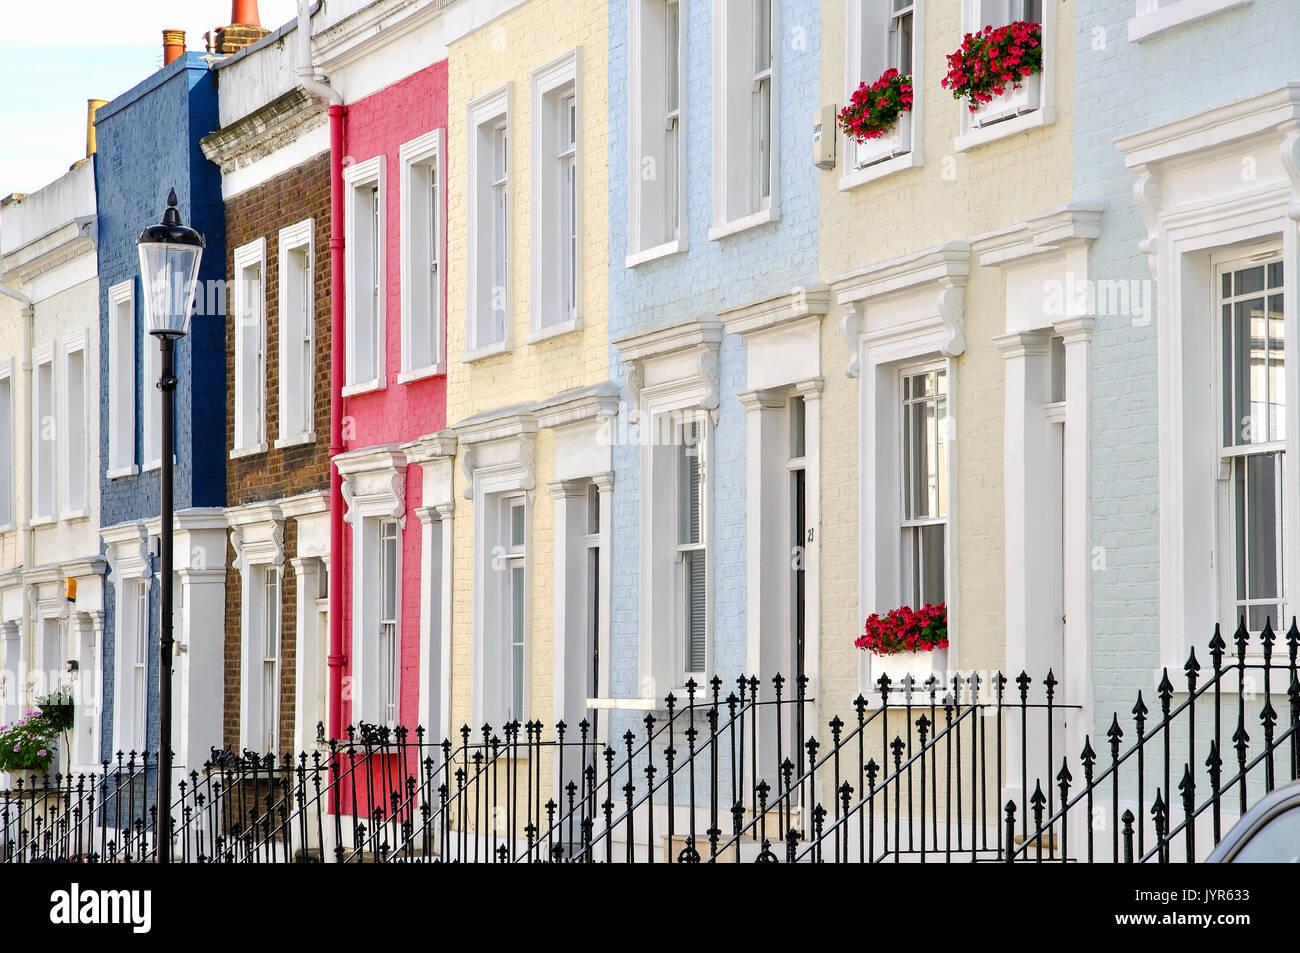 Terraced houses, Hillgate Place, Kensington, London Borough of Kensington and Chelsea, Greater London, England, United Kingdom - Stock Image